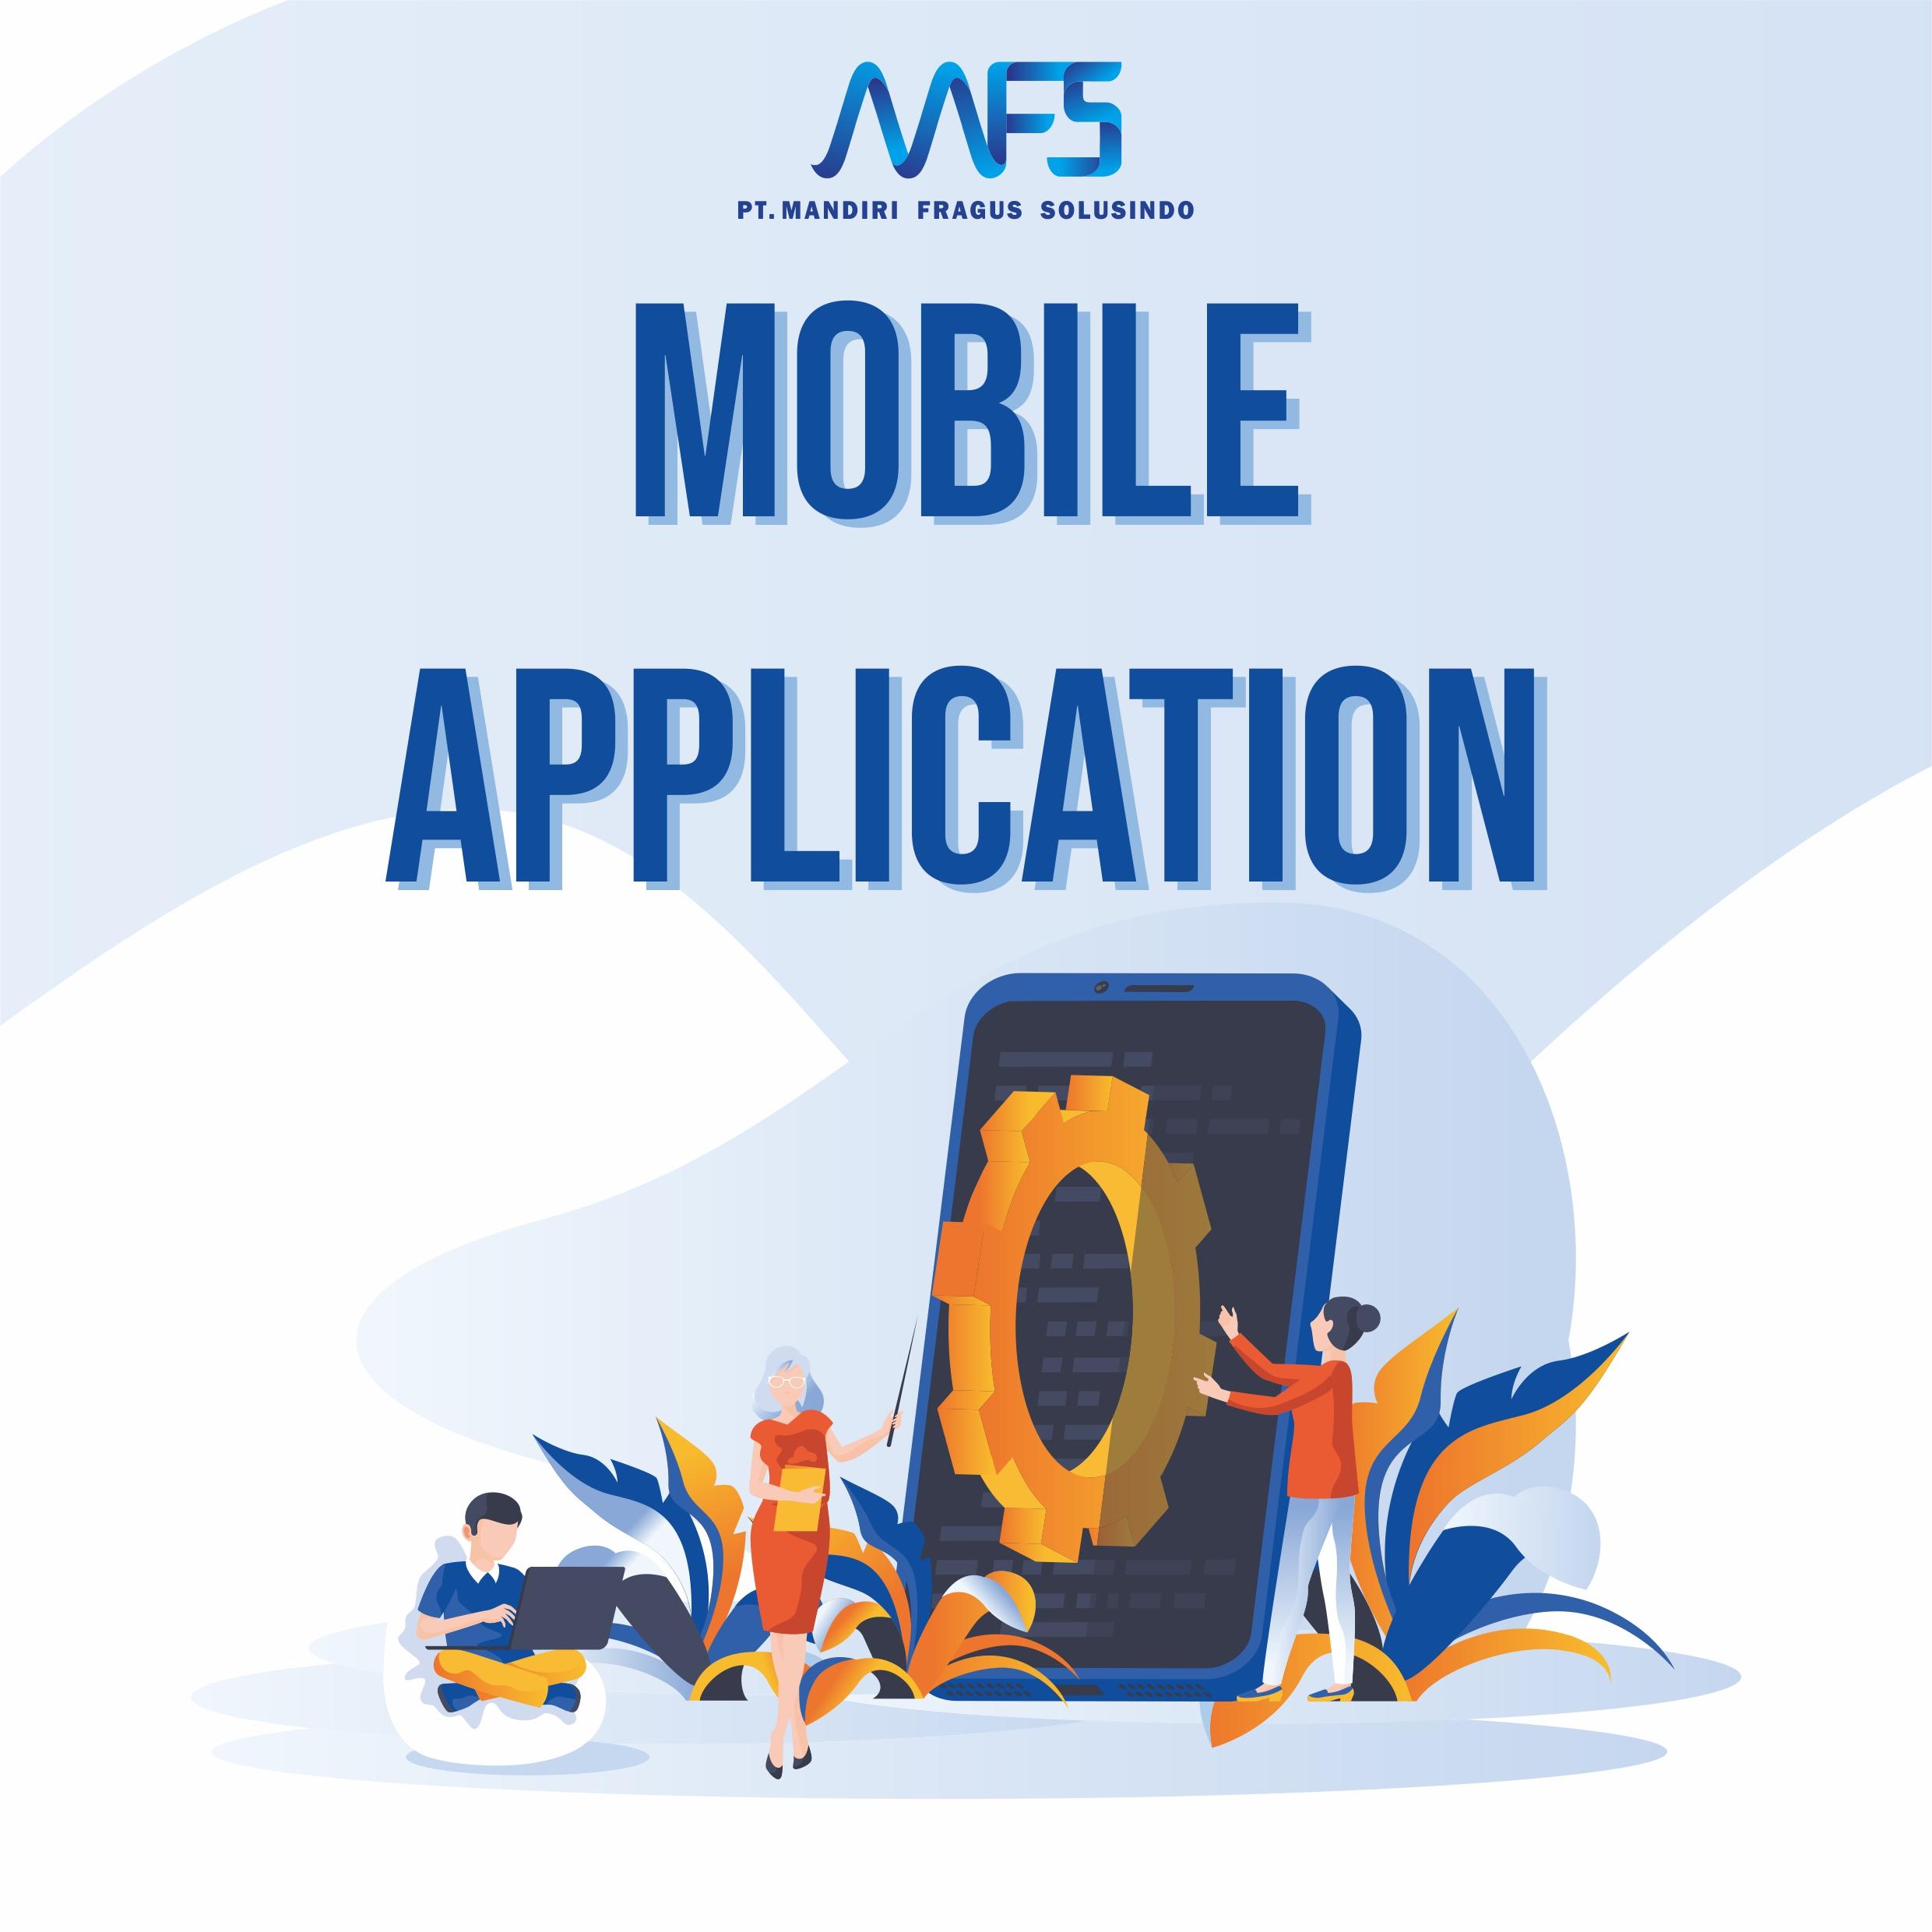 Manfaat mobile application android / ios bagi perusahaan